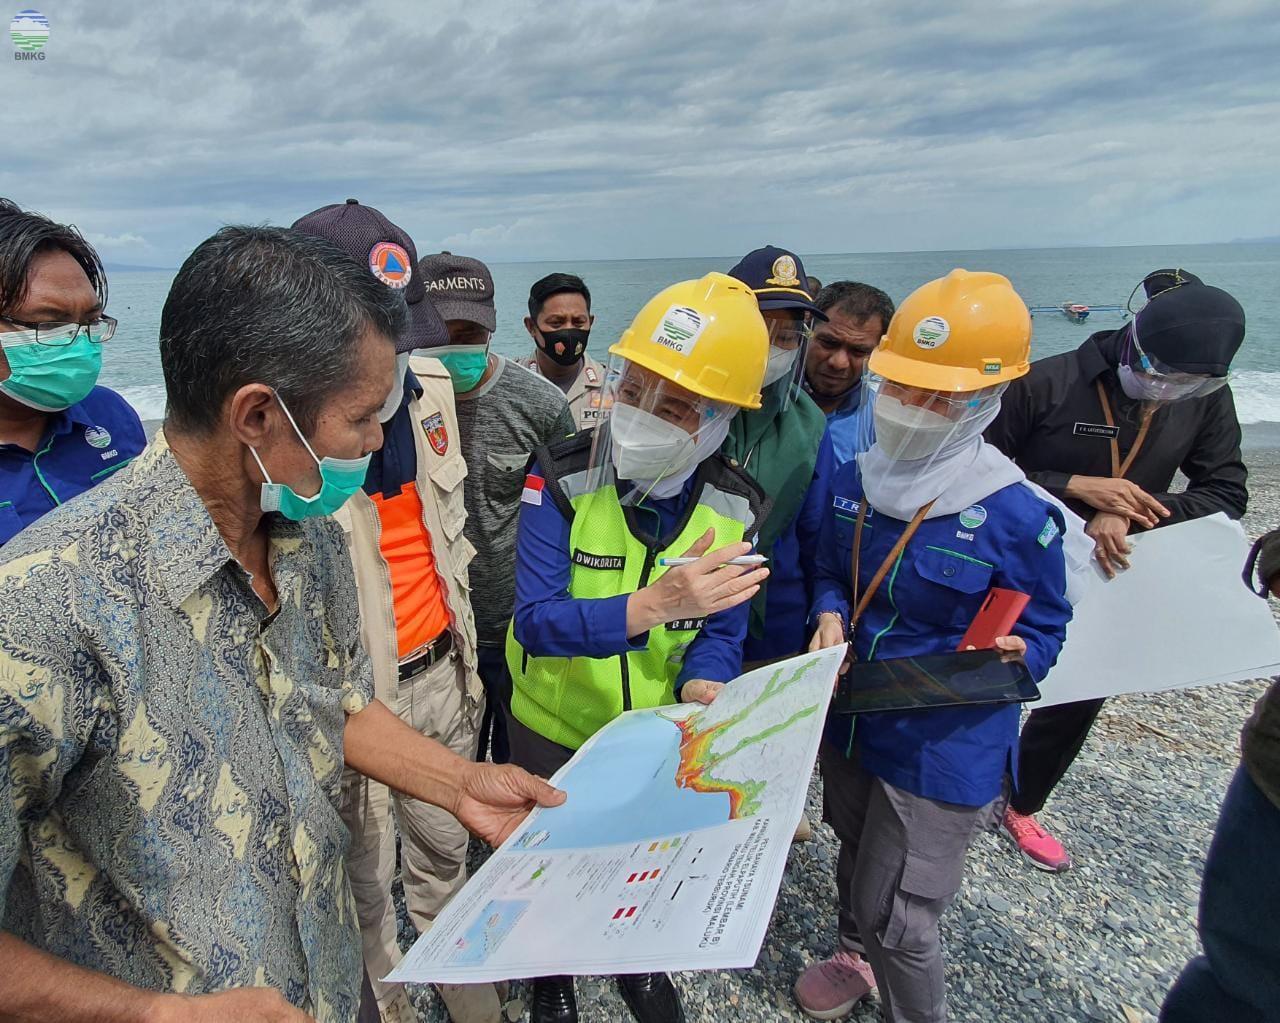 Perkuat Mitigasi Hadapi Bencana Gempabumi dan Tsunami, Kepala BMKG Kunjungi Prov. Maluku